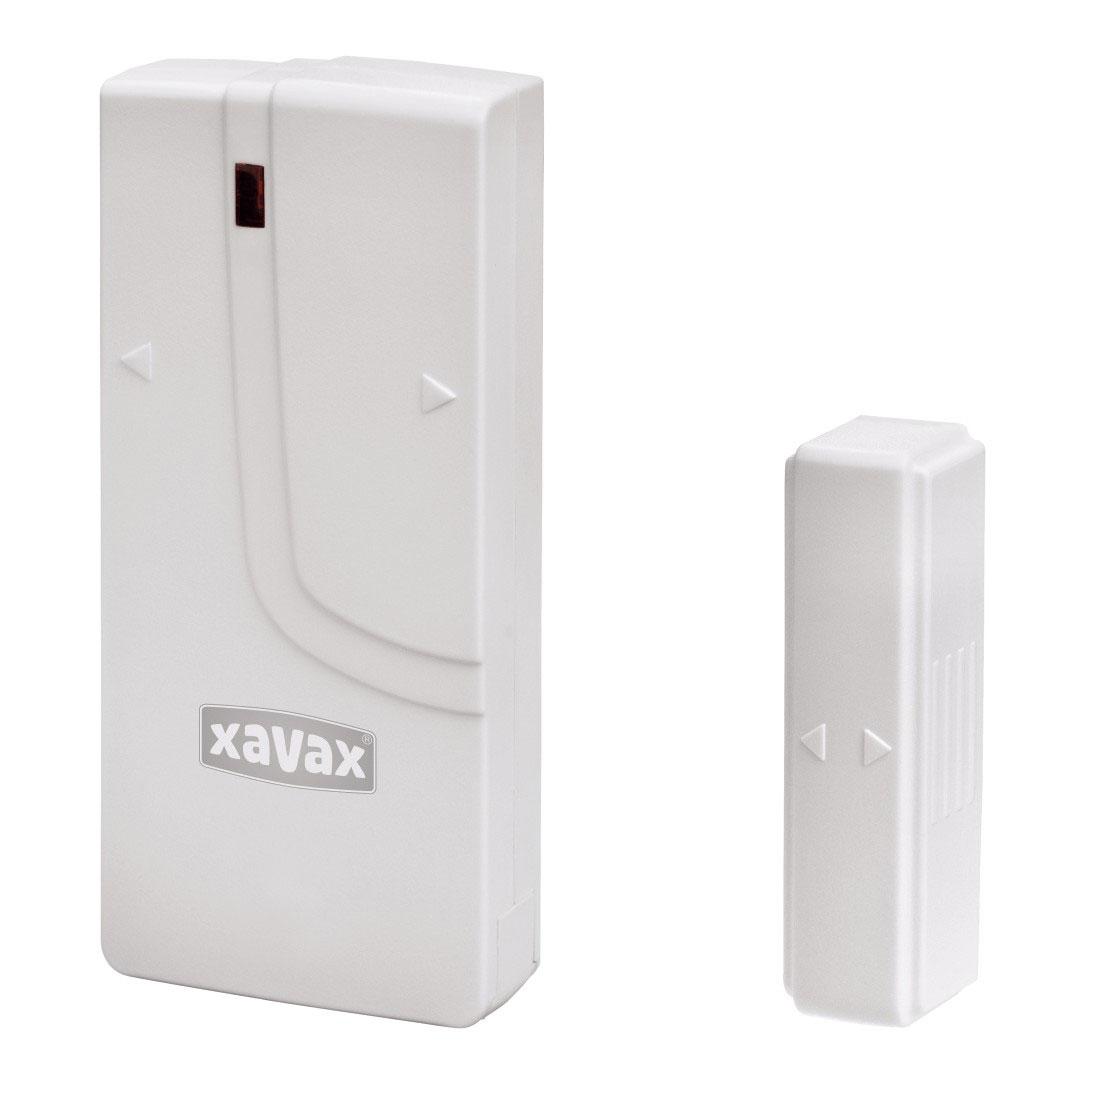 Xavax by Hama 111979 Fenster/Türsensor für Funk-Alarm-System